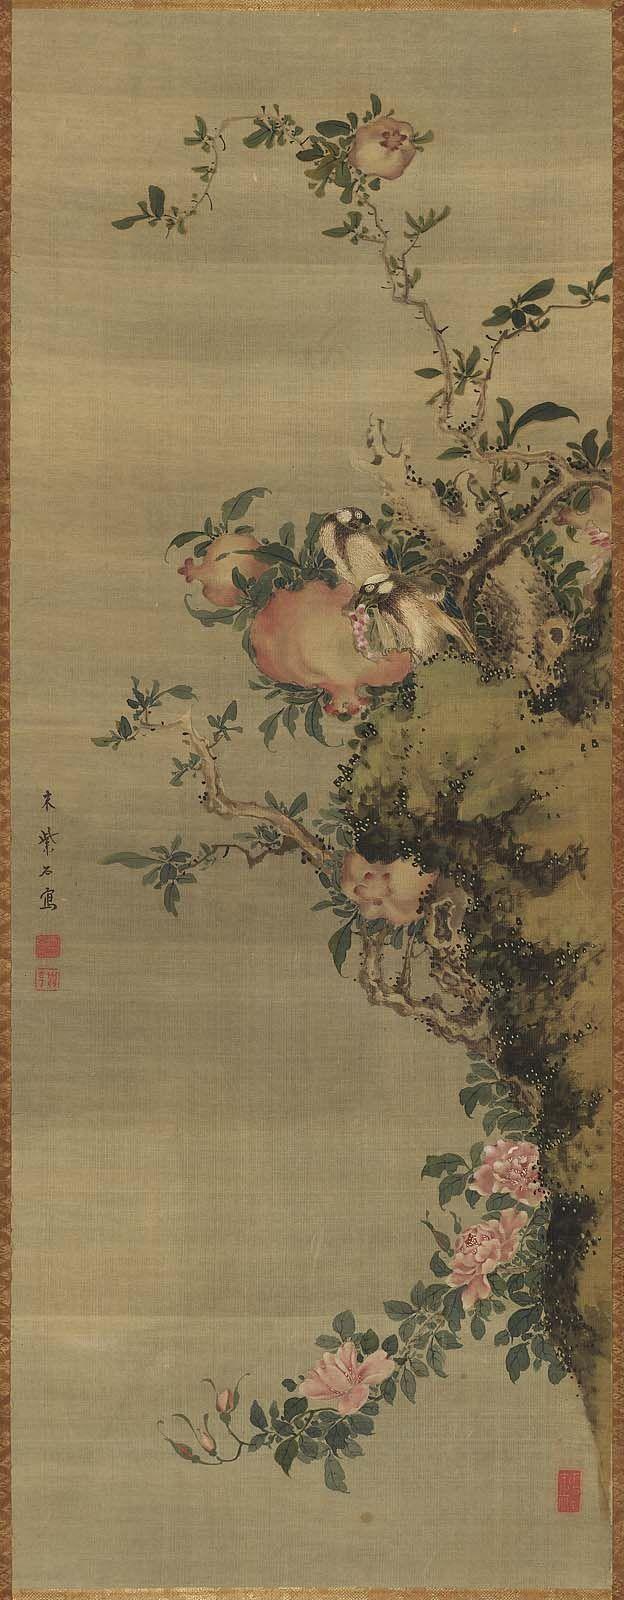 Birds and Pomegranates 石榴に白頭翁図 Nagasaki Edo period 18th century Sô Shiseki (Japanese, 1712–1786)